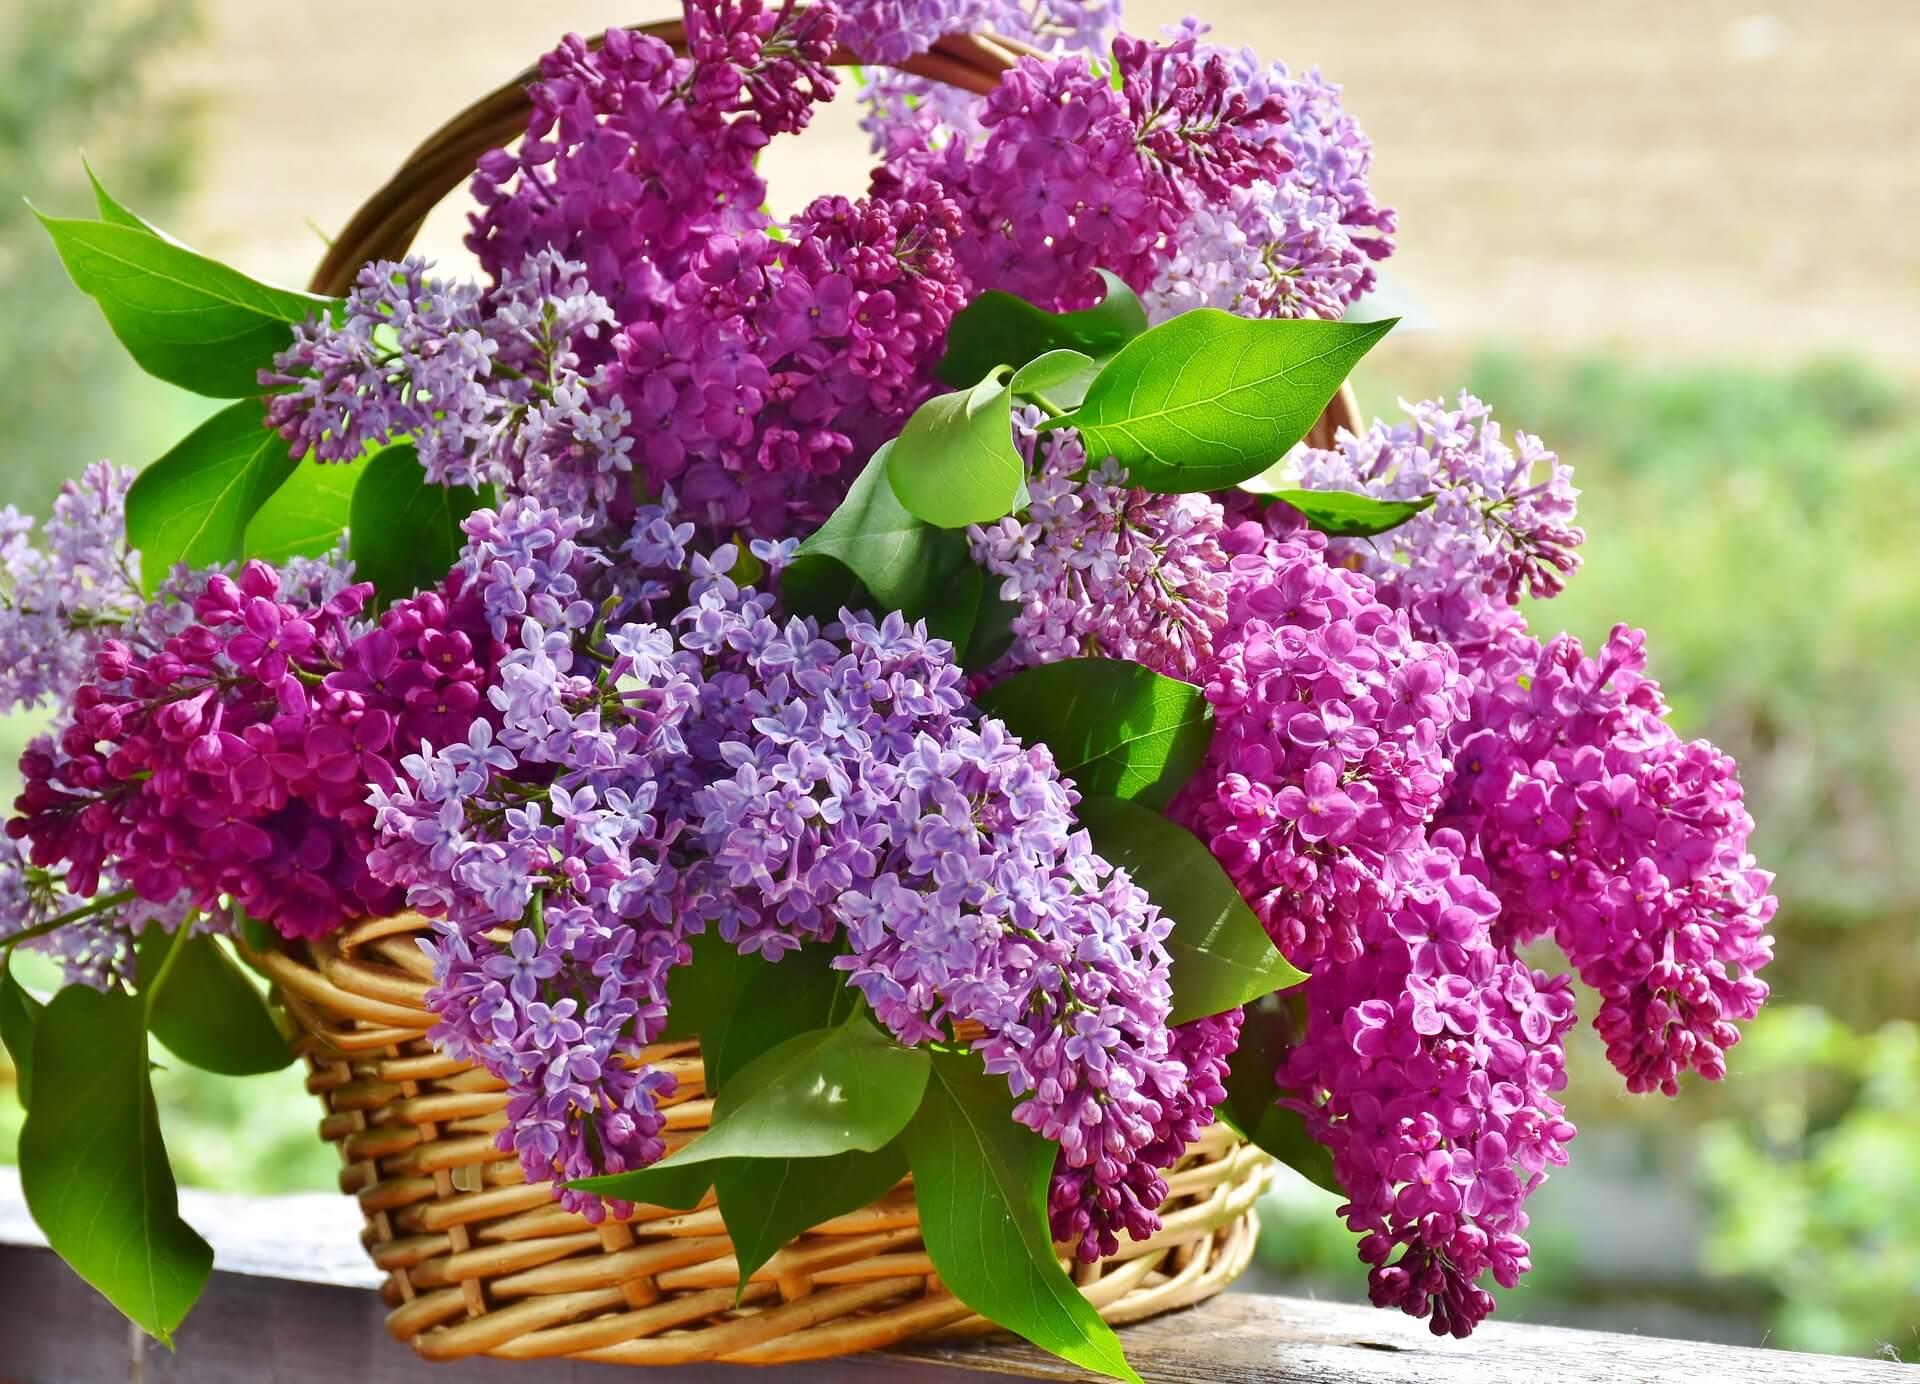 blommor mors dag KryddaDinResa